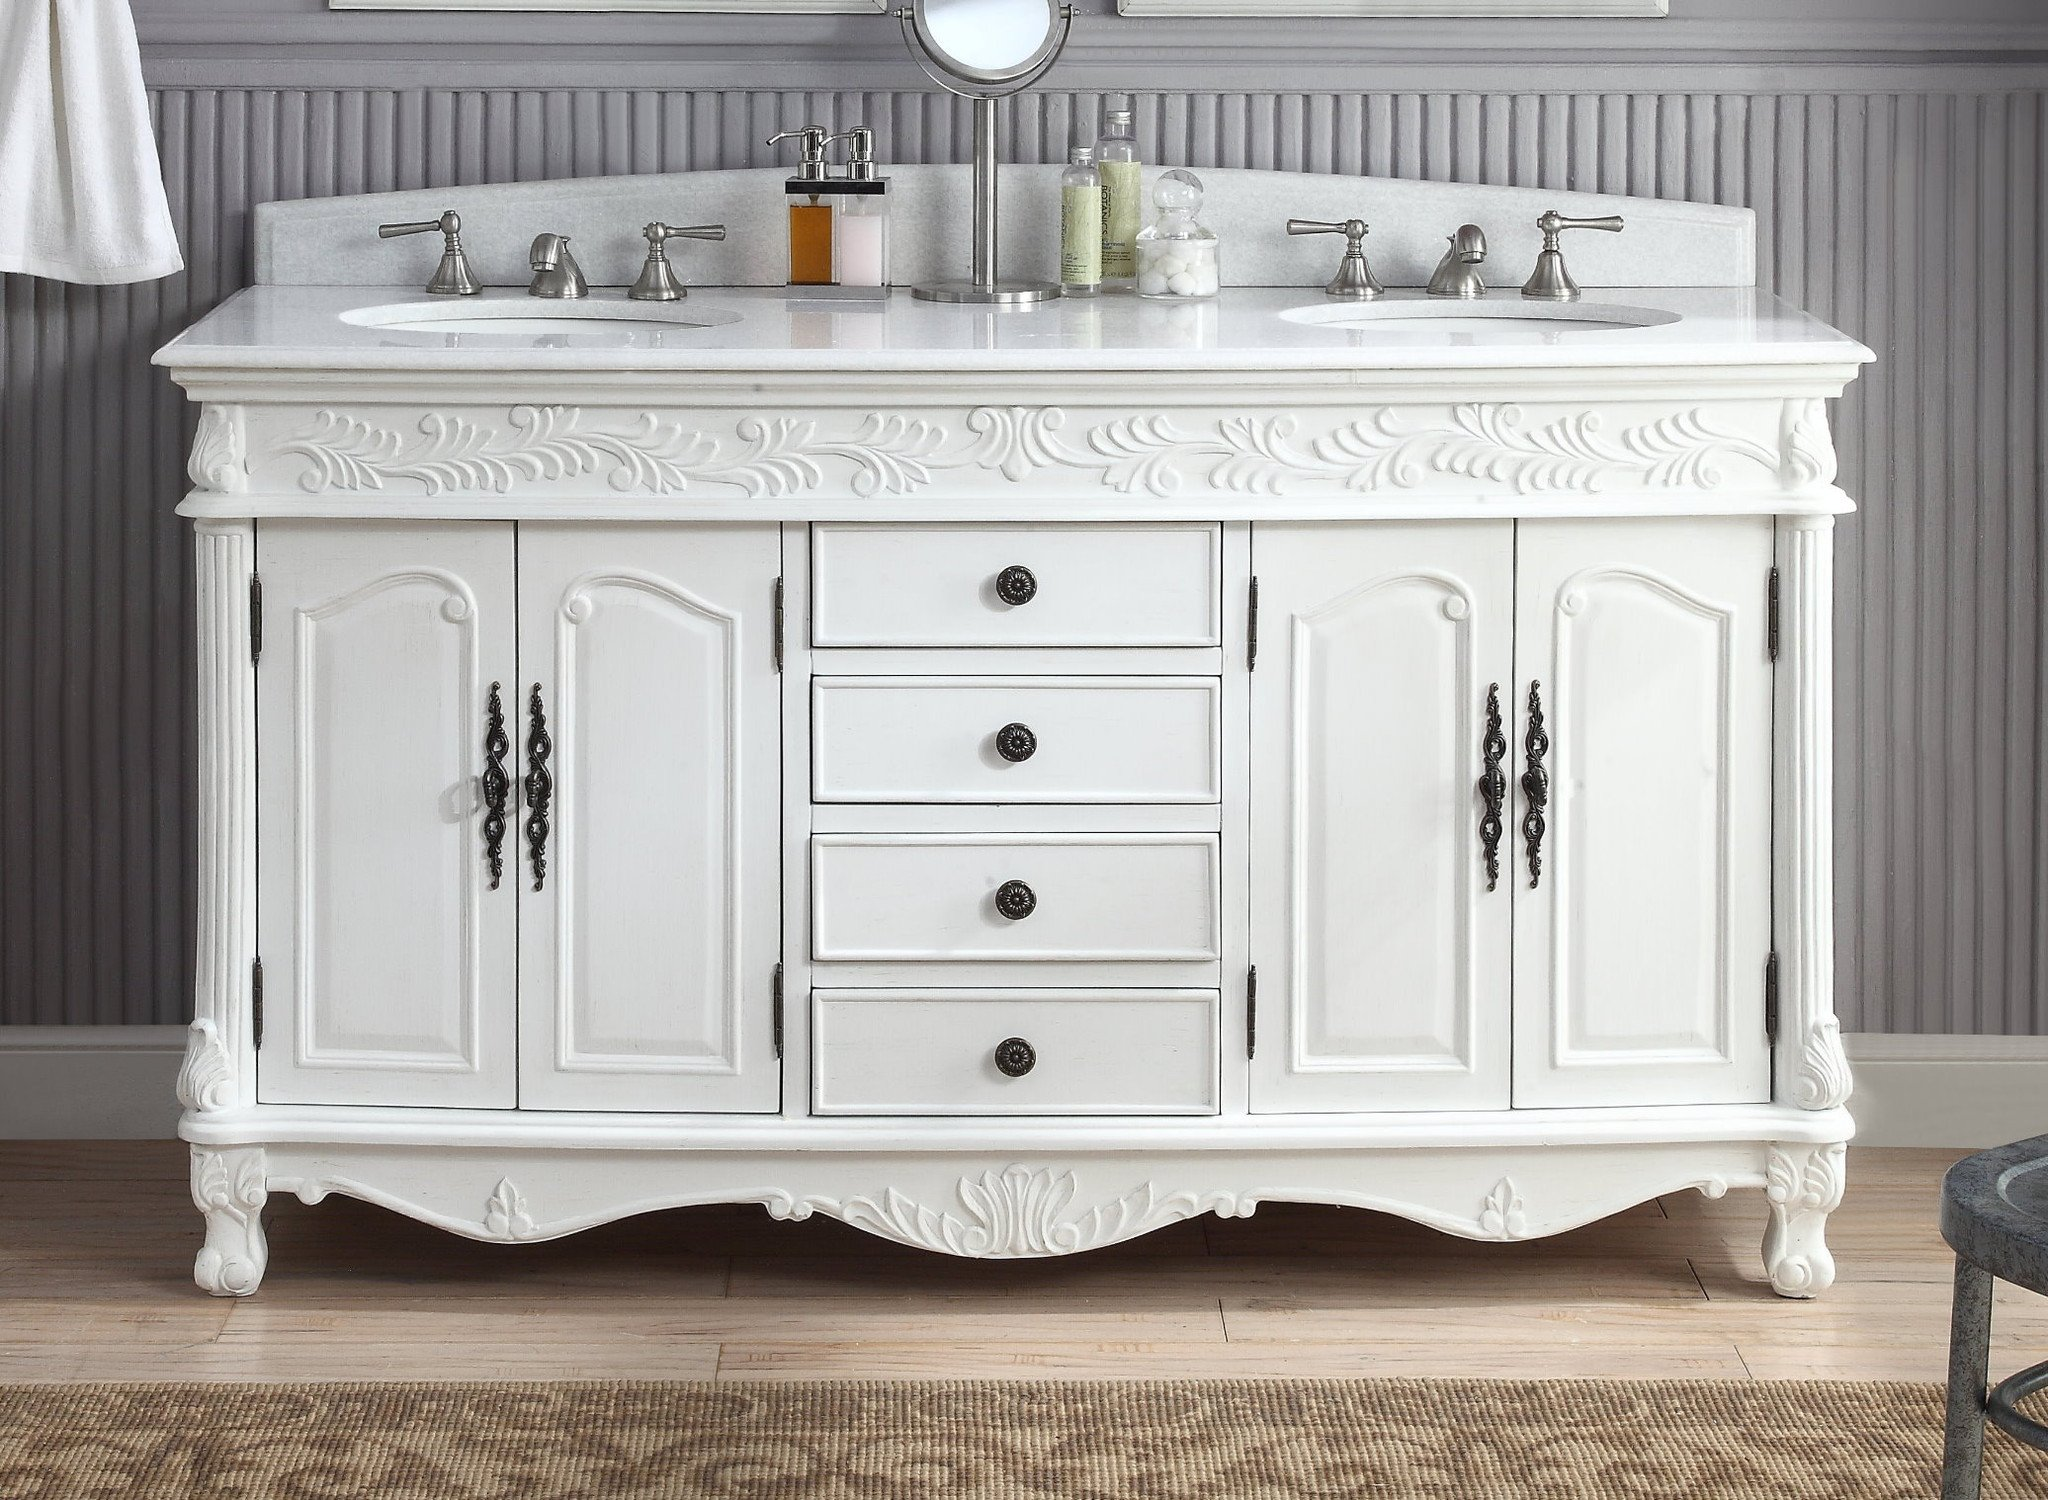 Chans Furniture Hf036xlw Aw Florence 63 Inch White Bathroom Double Sink Vanity Hf036xlw Aw